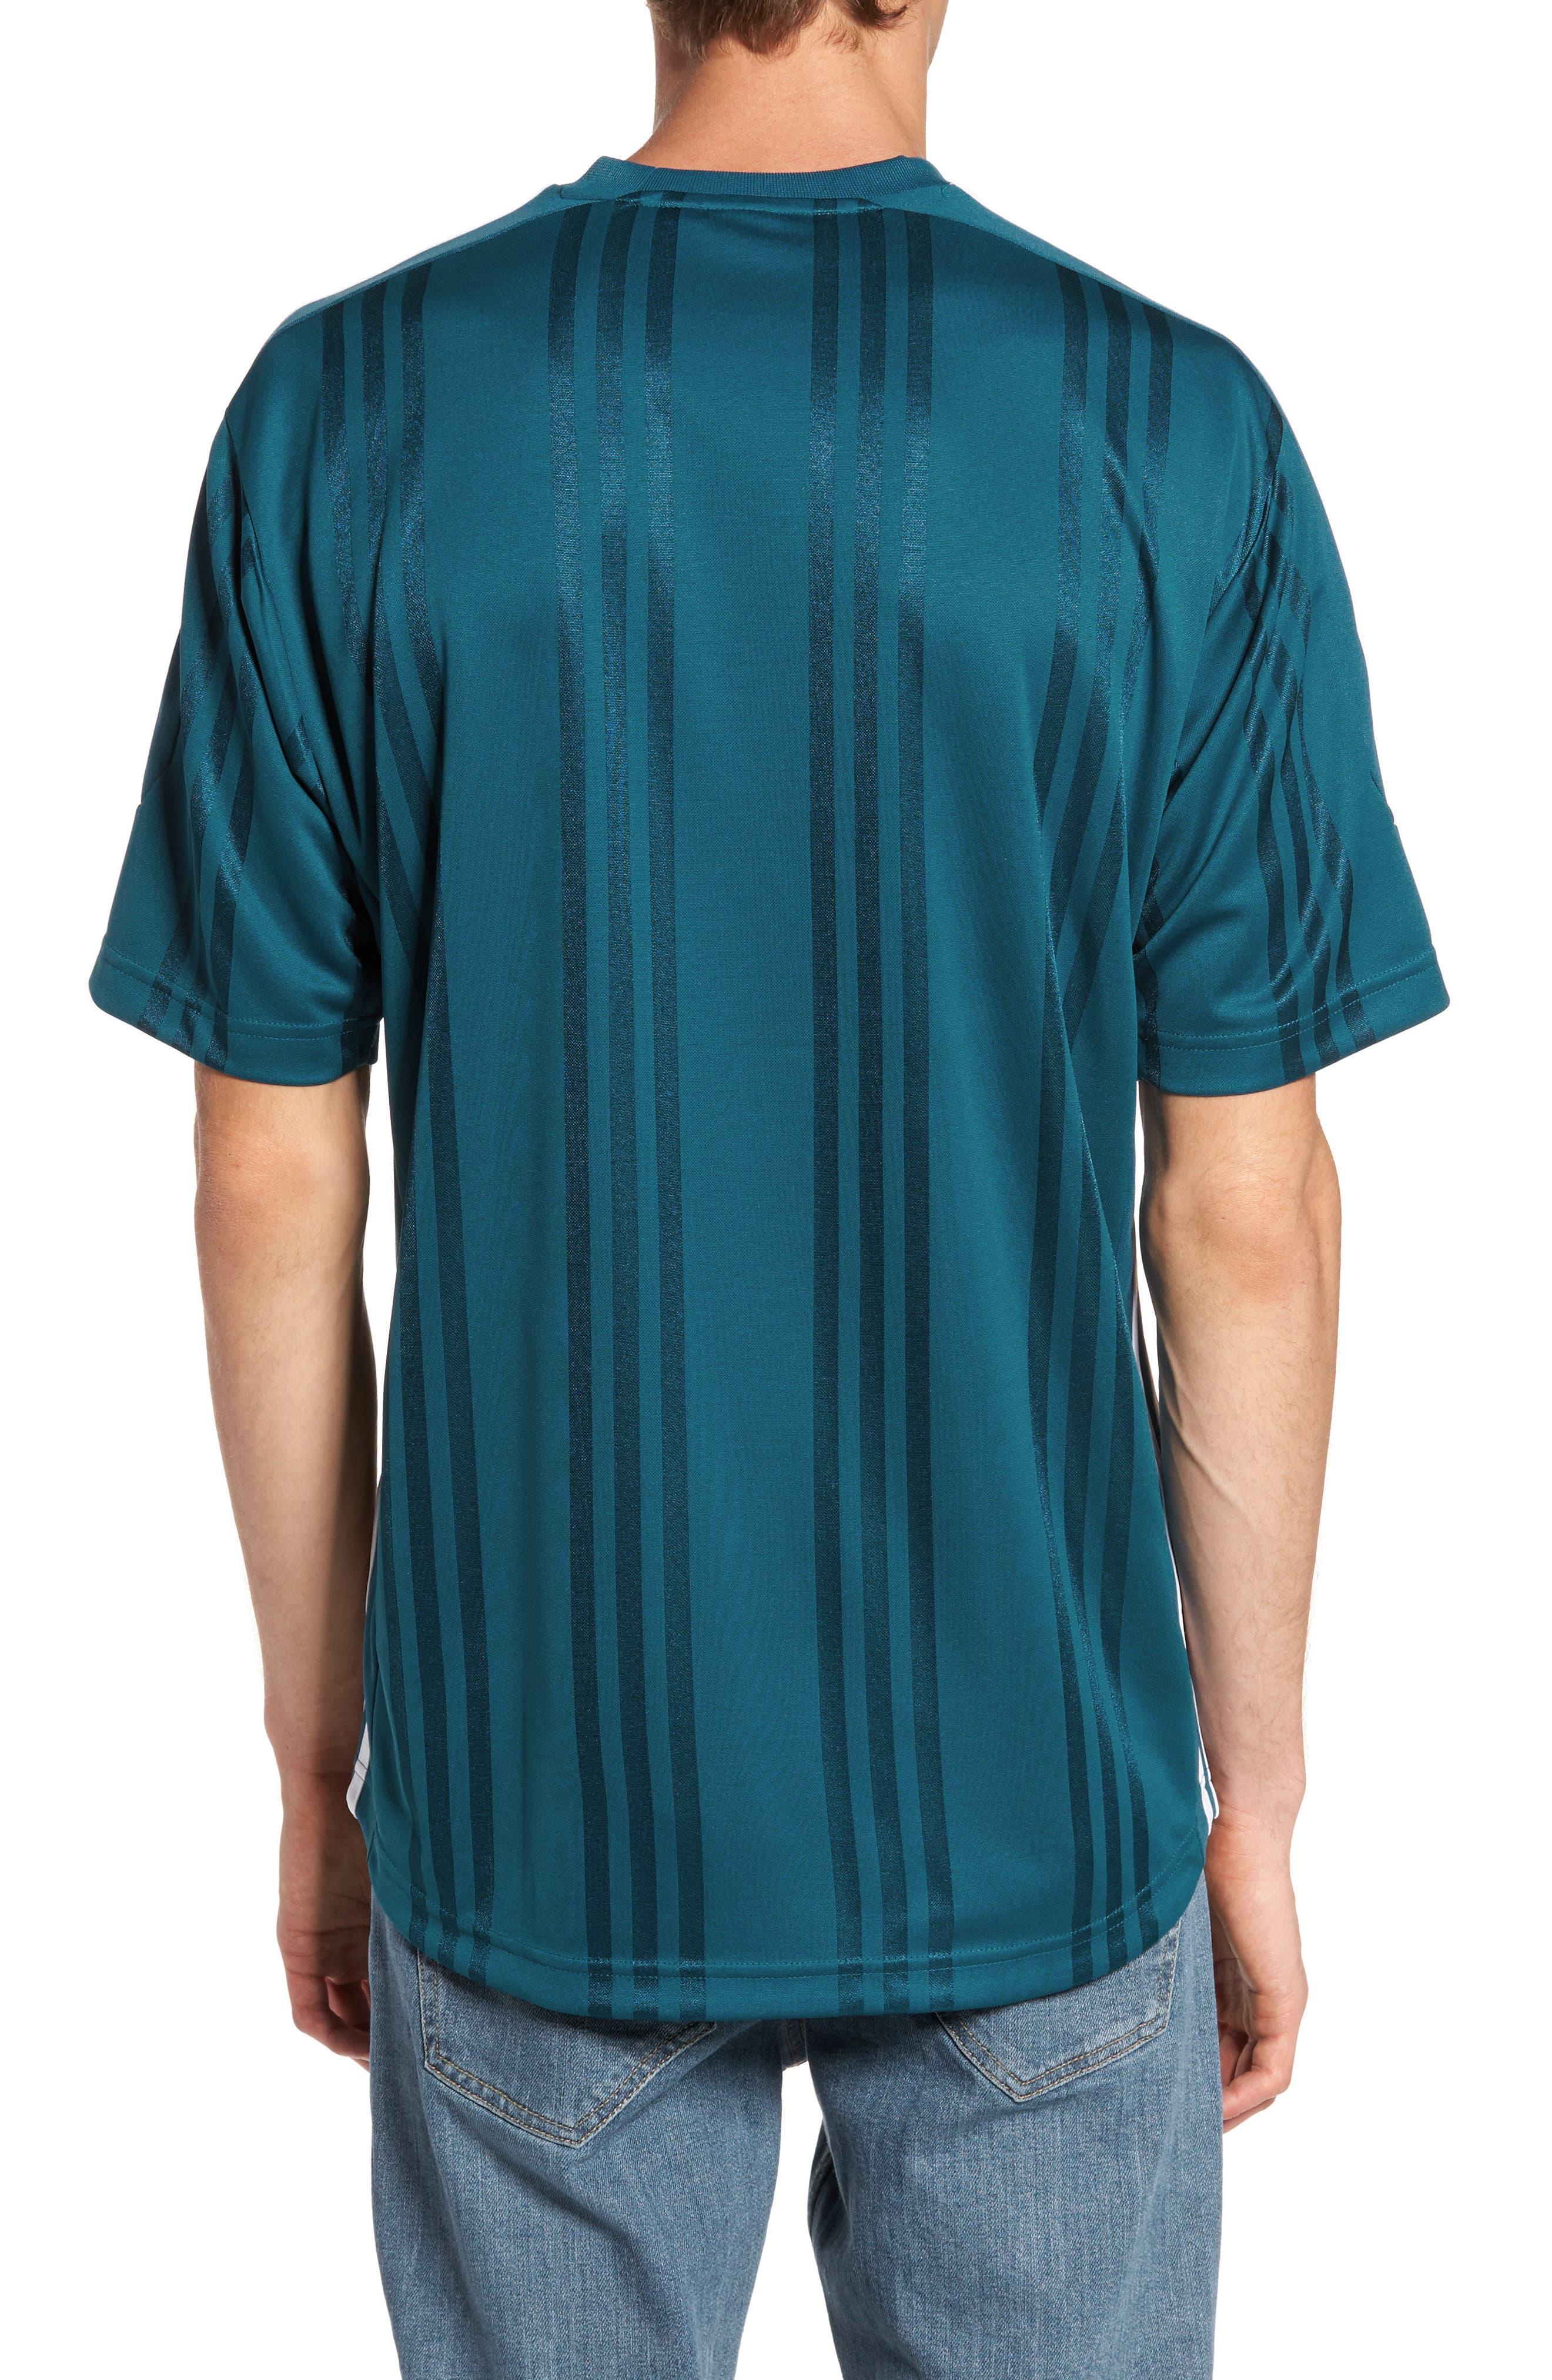 Originals Jacquard Stripe T-Shirt,                             Alternate thumbnail 2, color,                             Real Teal